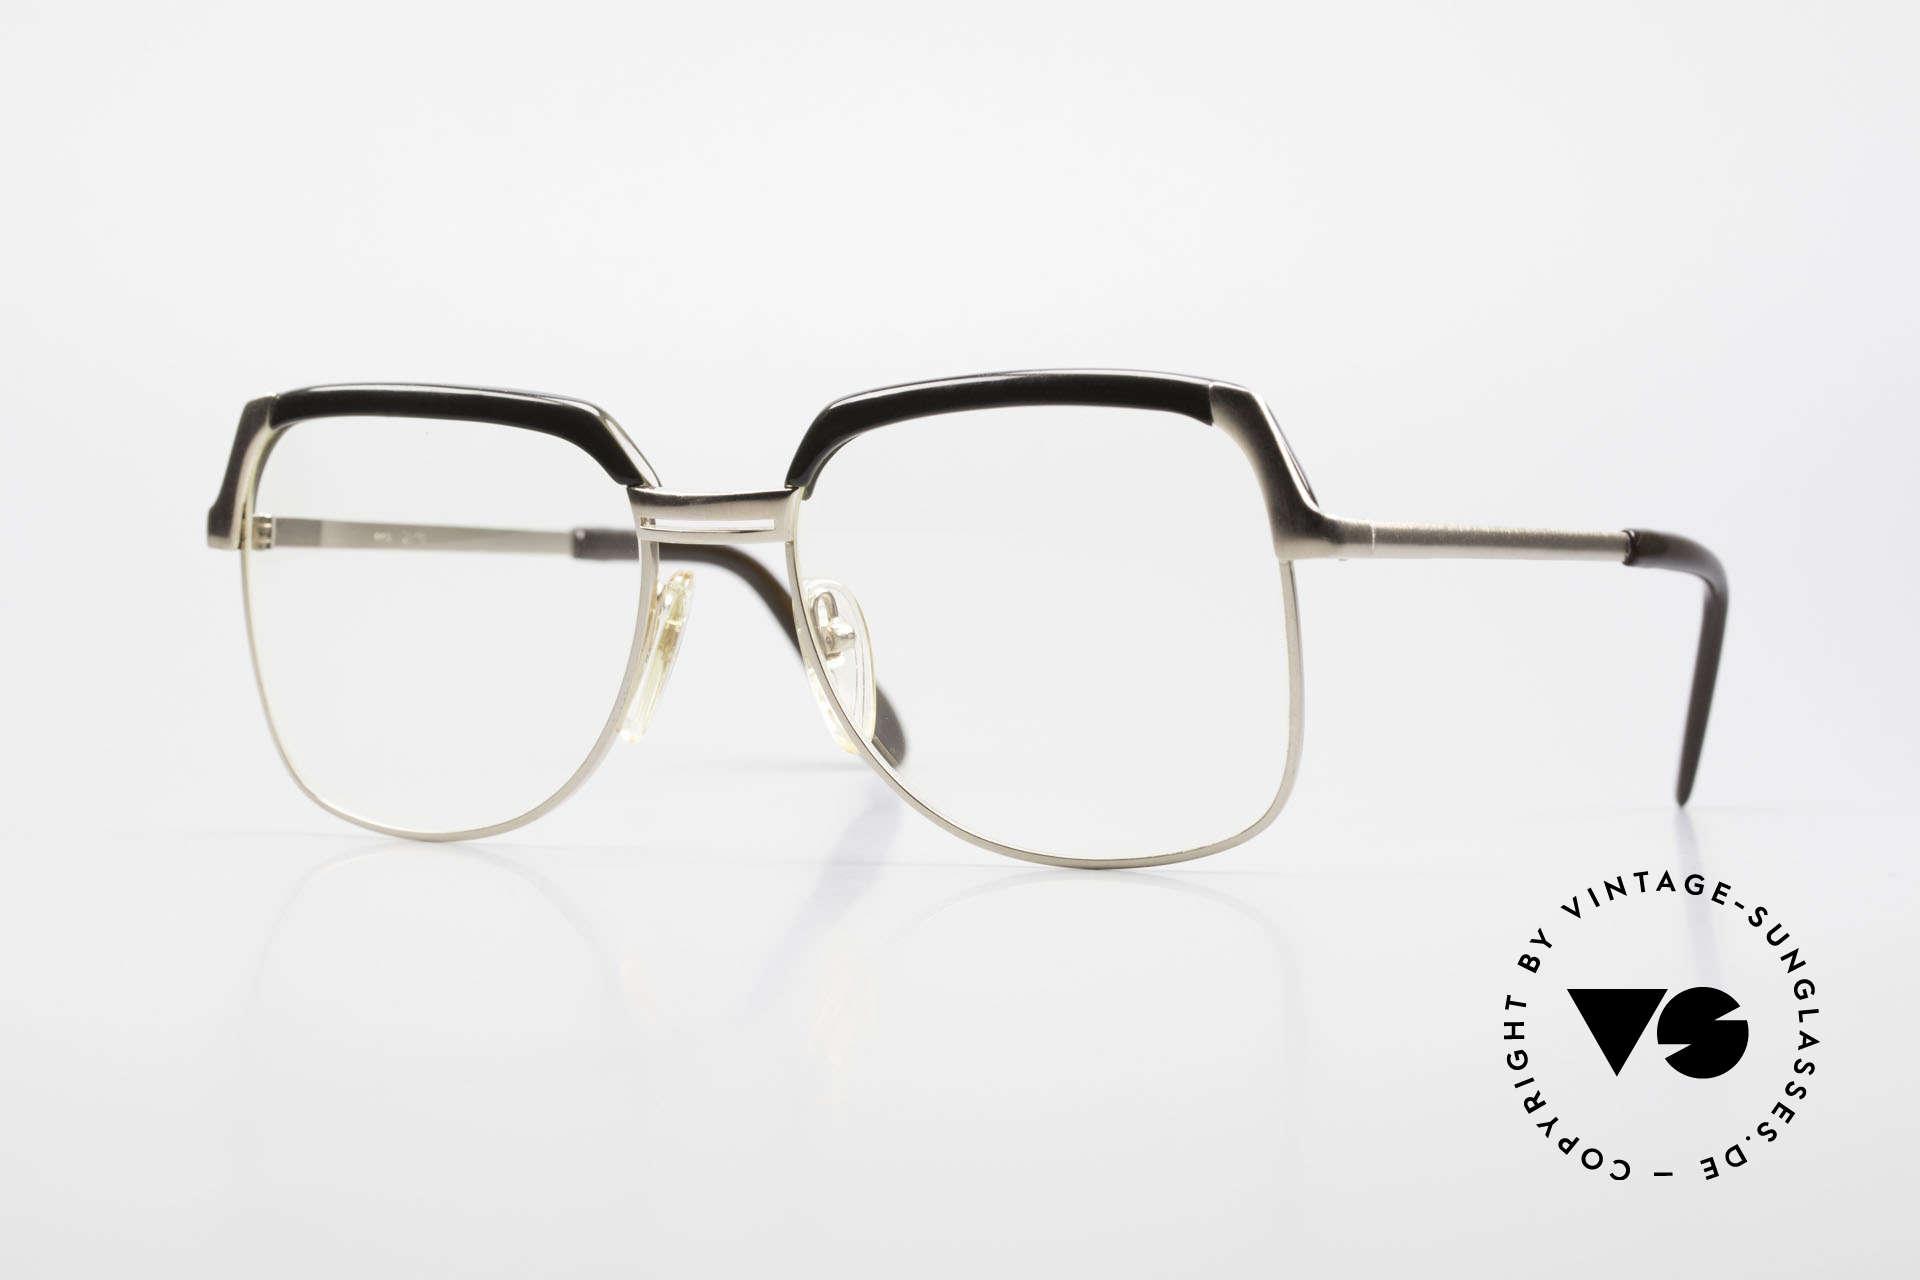 Bausch & Lomb 418 Gold Filled 80's Combi Frame, rare 1980's designer eyeglasses by BAUSCH & LOMB, Made for Men